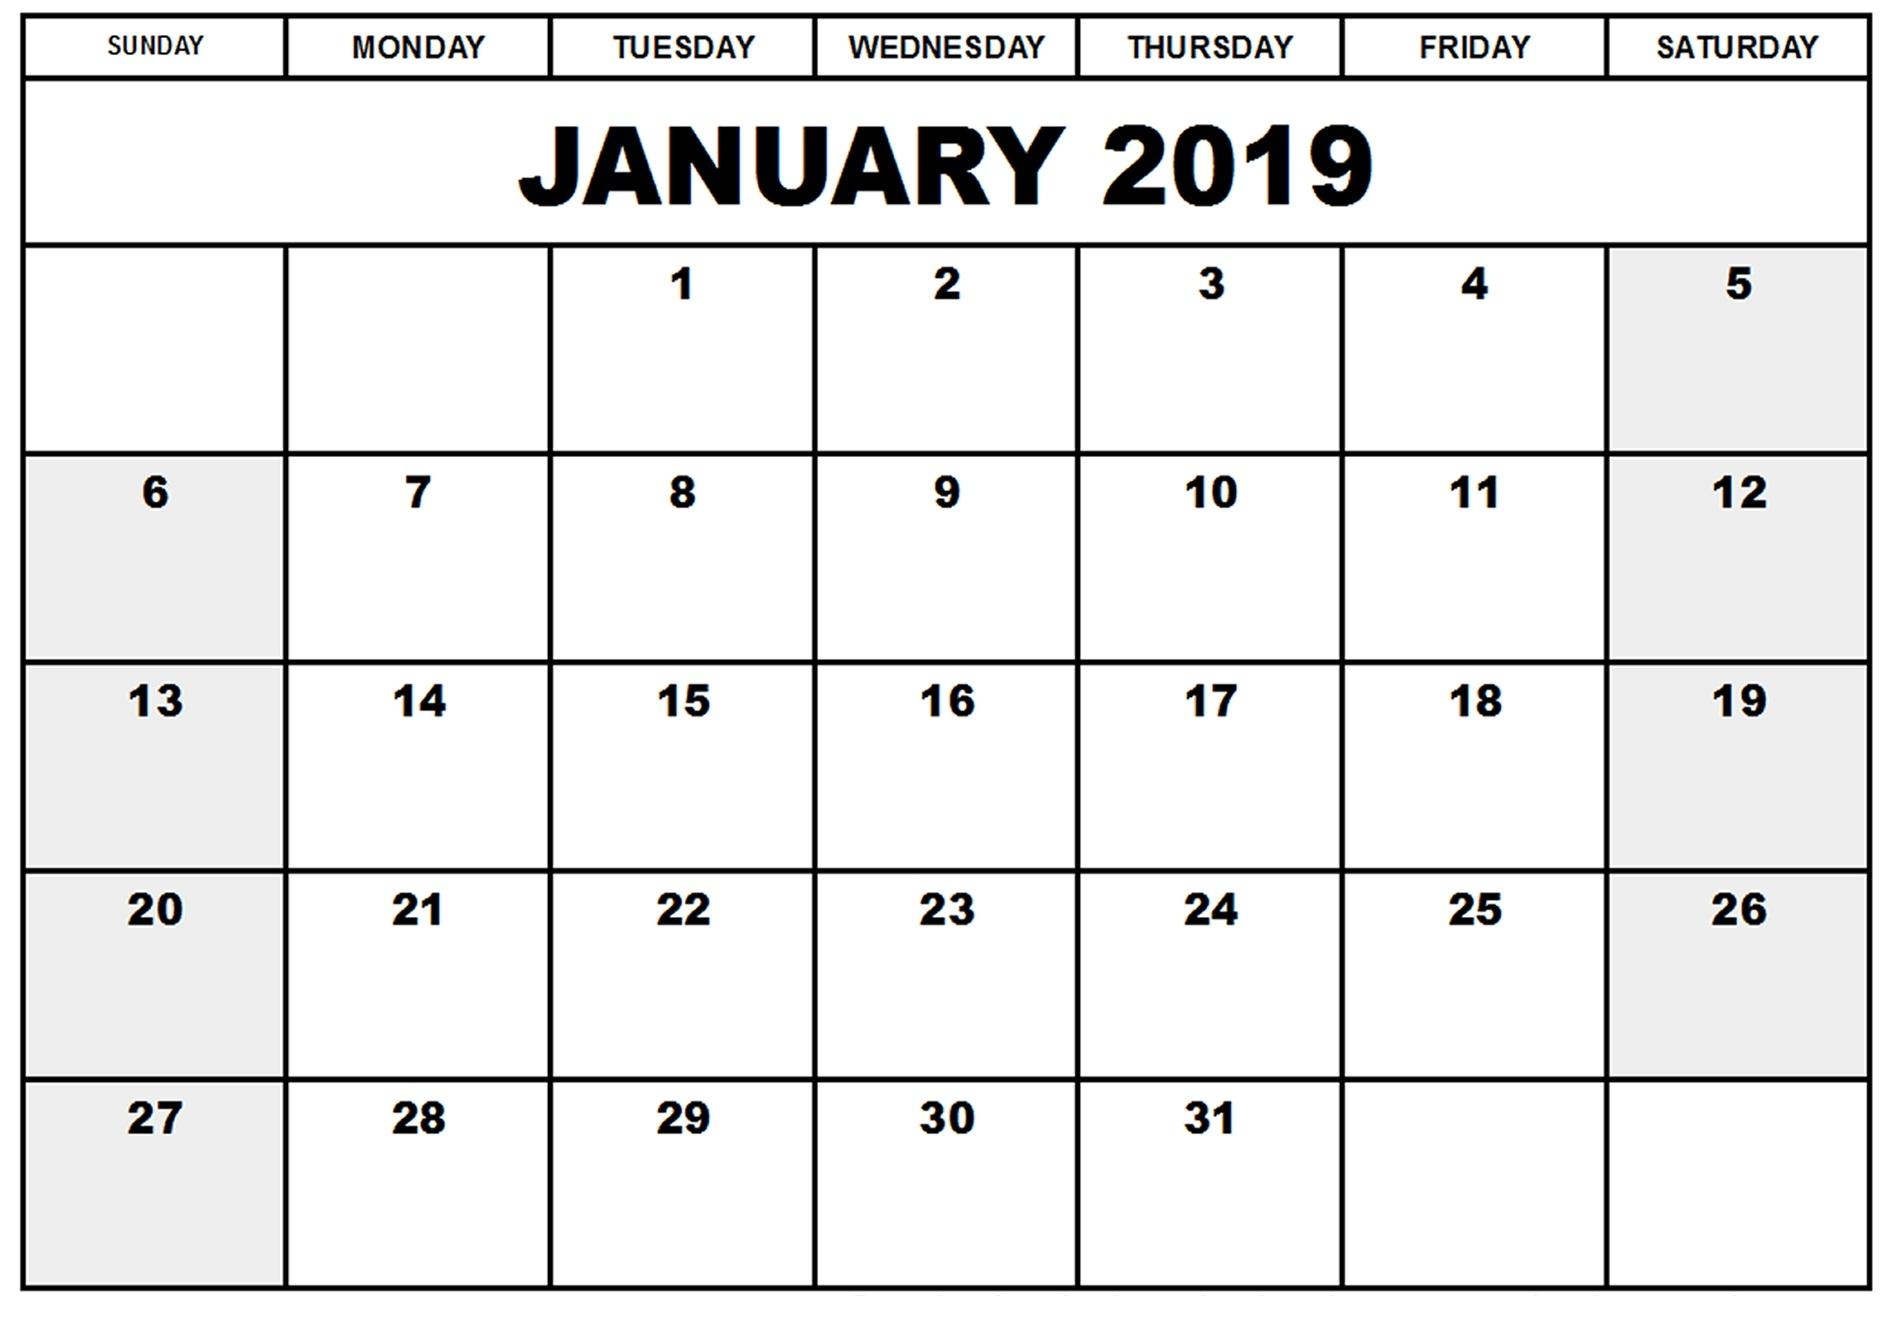 January Blank Calendar 2019 To Print